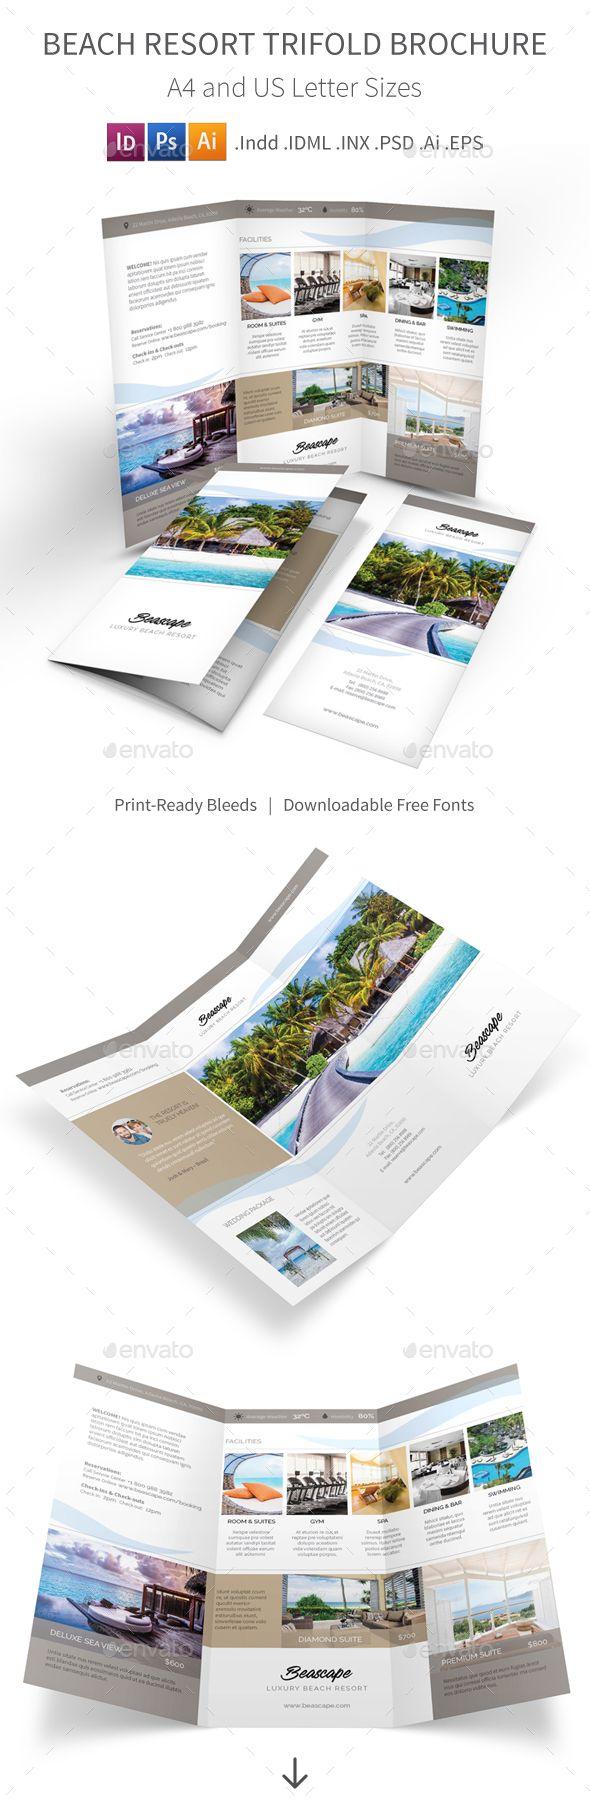 Beach Resort Trifold Brochure Template. Download here: http://graphicriver.net/item/beach-resort-trifold-brochure-2/15729081?ref=ksioks